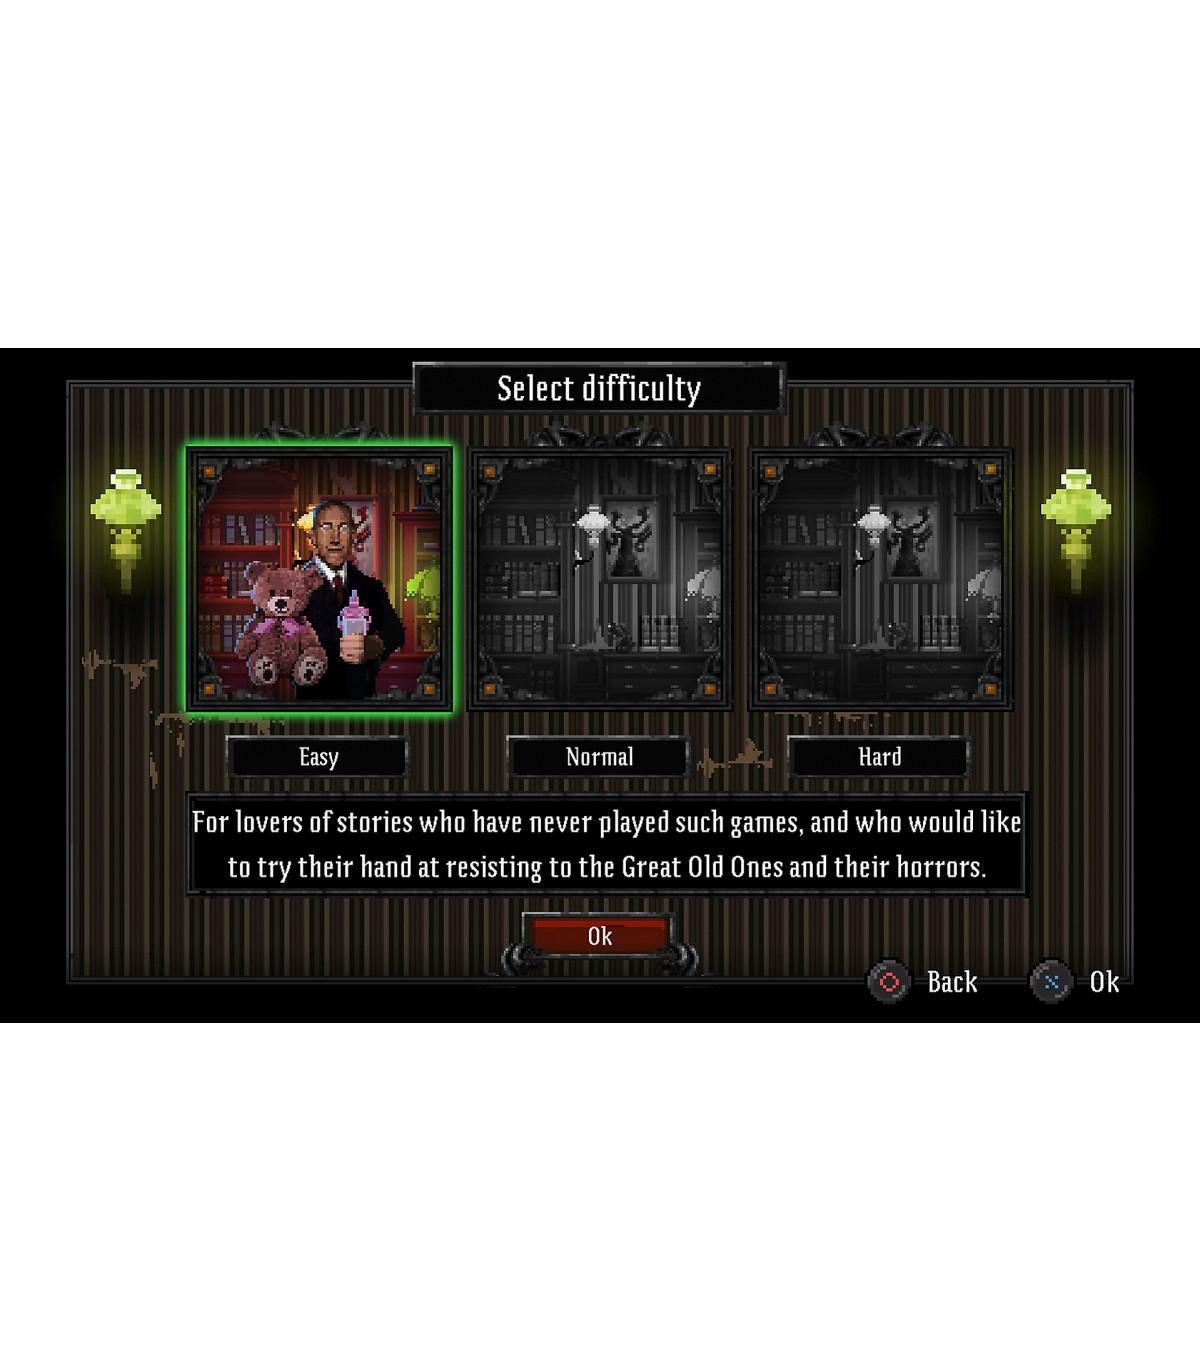 بازی Lovecraft's Untold Stories - پلی استیشن 4